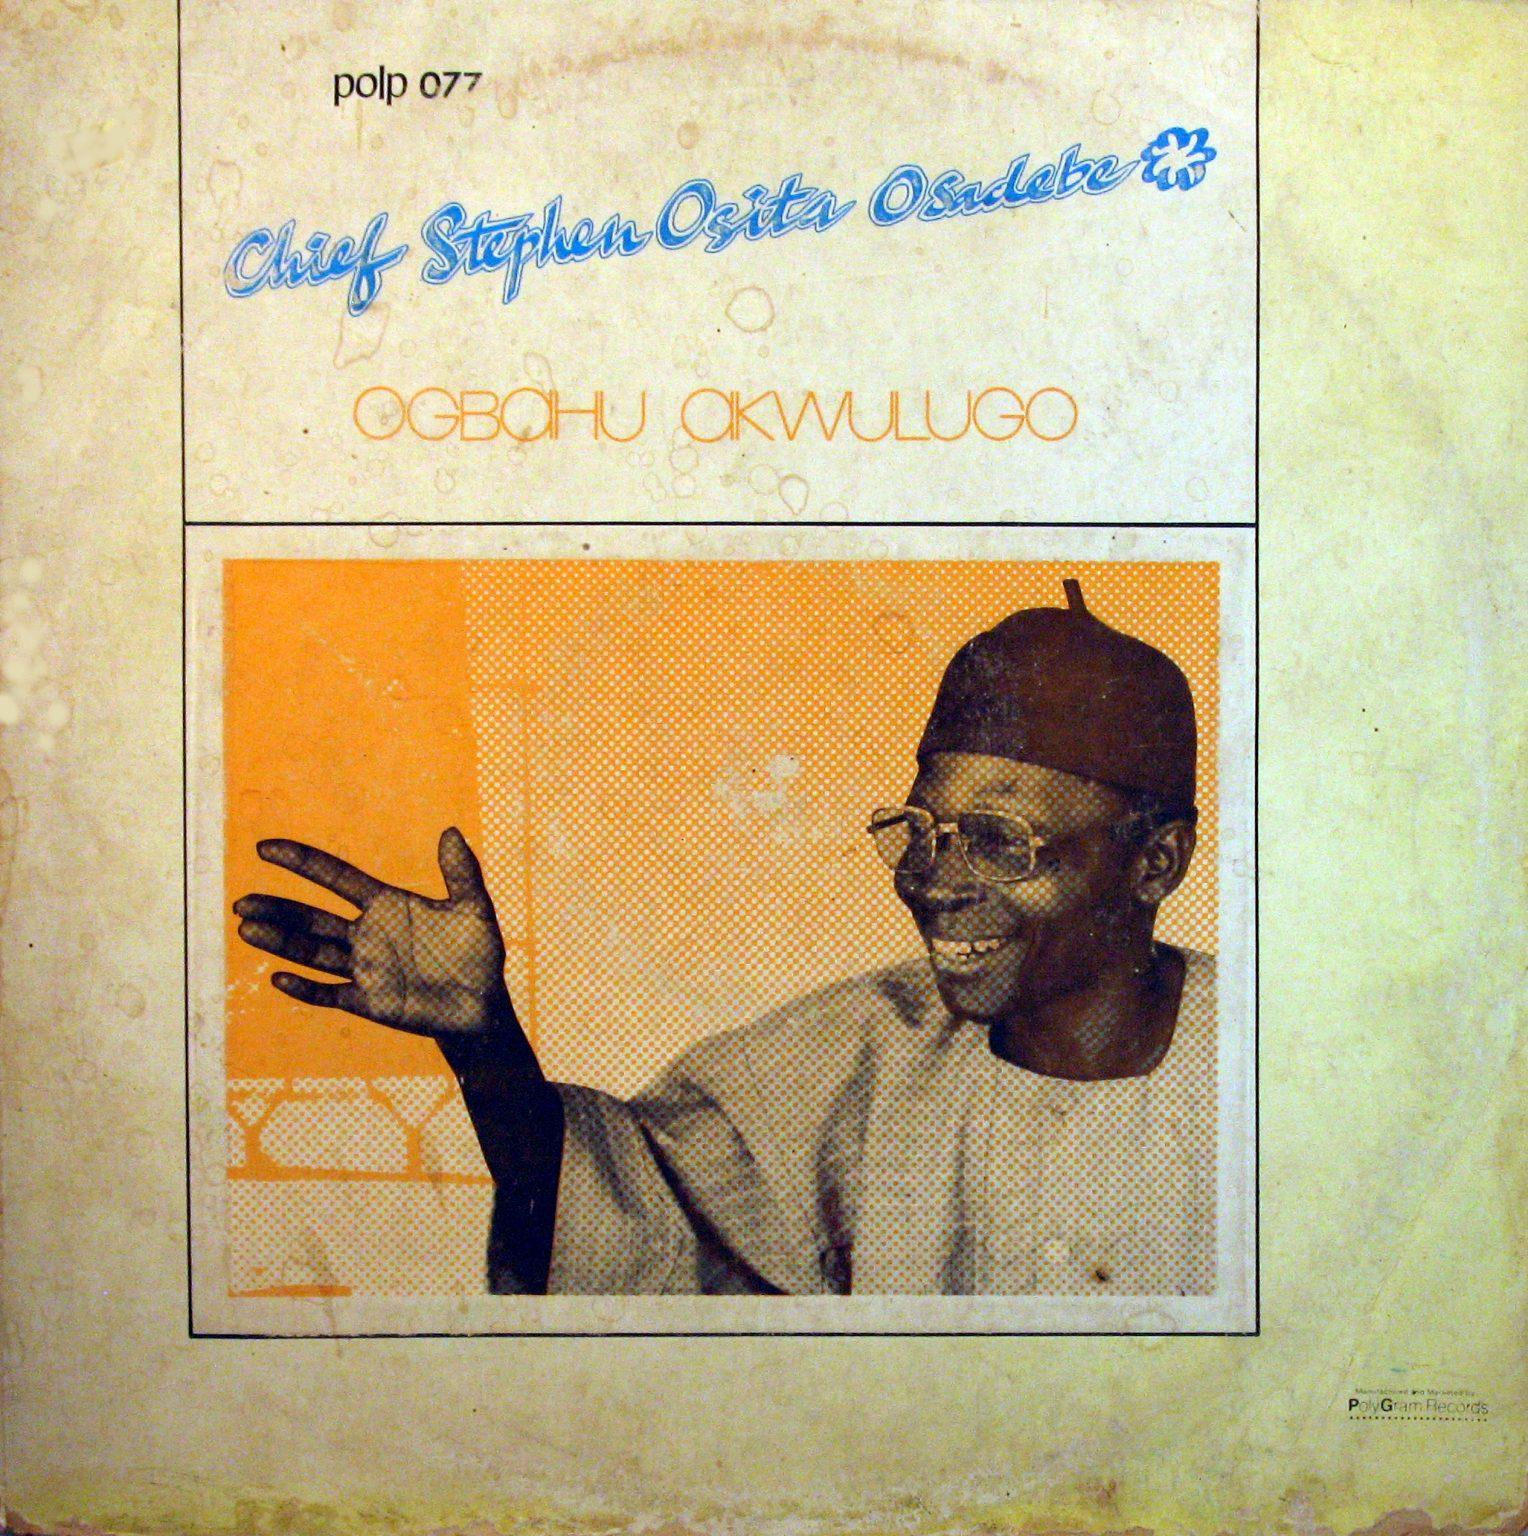 Chief Stephen Osita Osadebe And His Nigerian Sound Makers International – Ogbahu Akwulugo NIGERIAN Highlife Folk Music ALBUM Lp